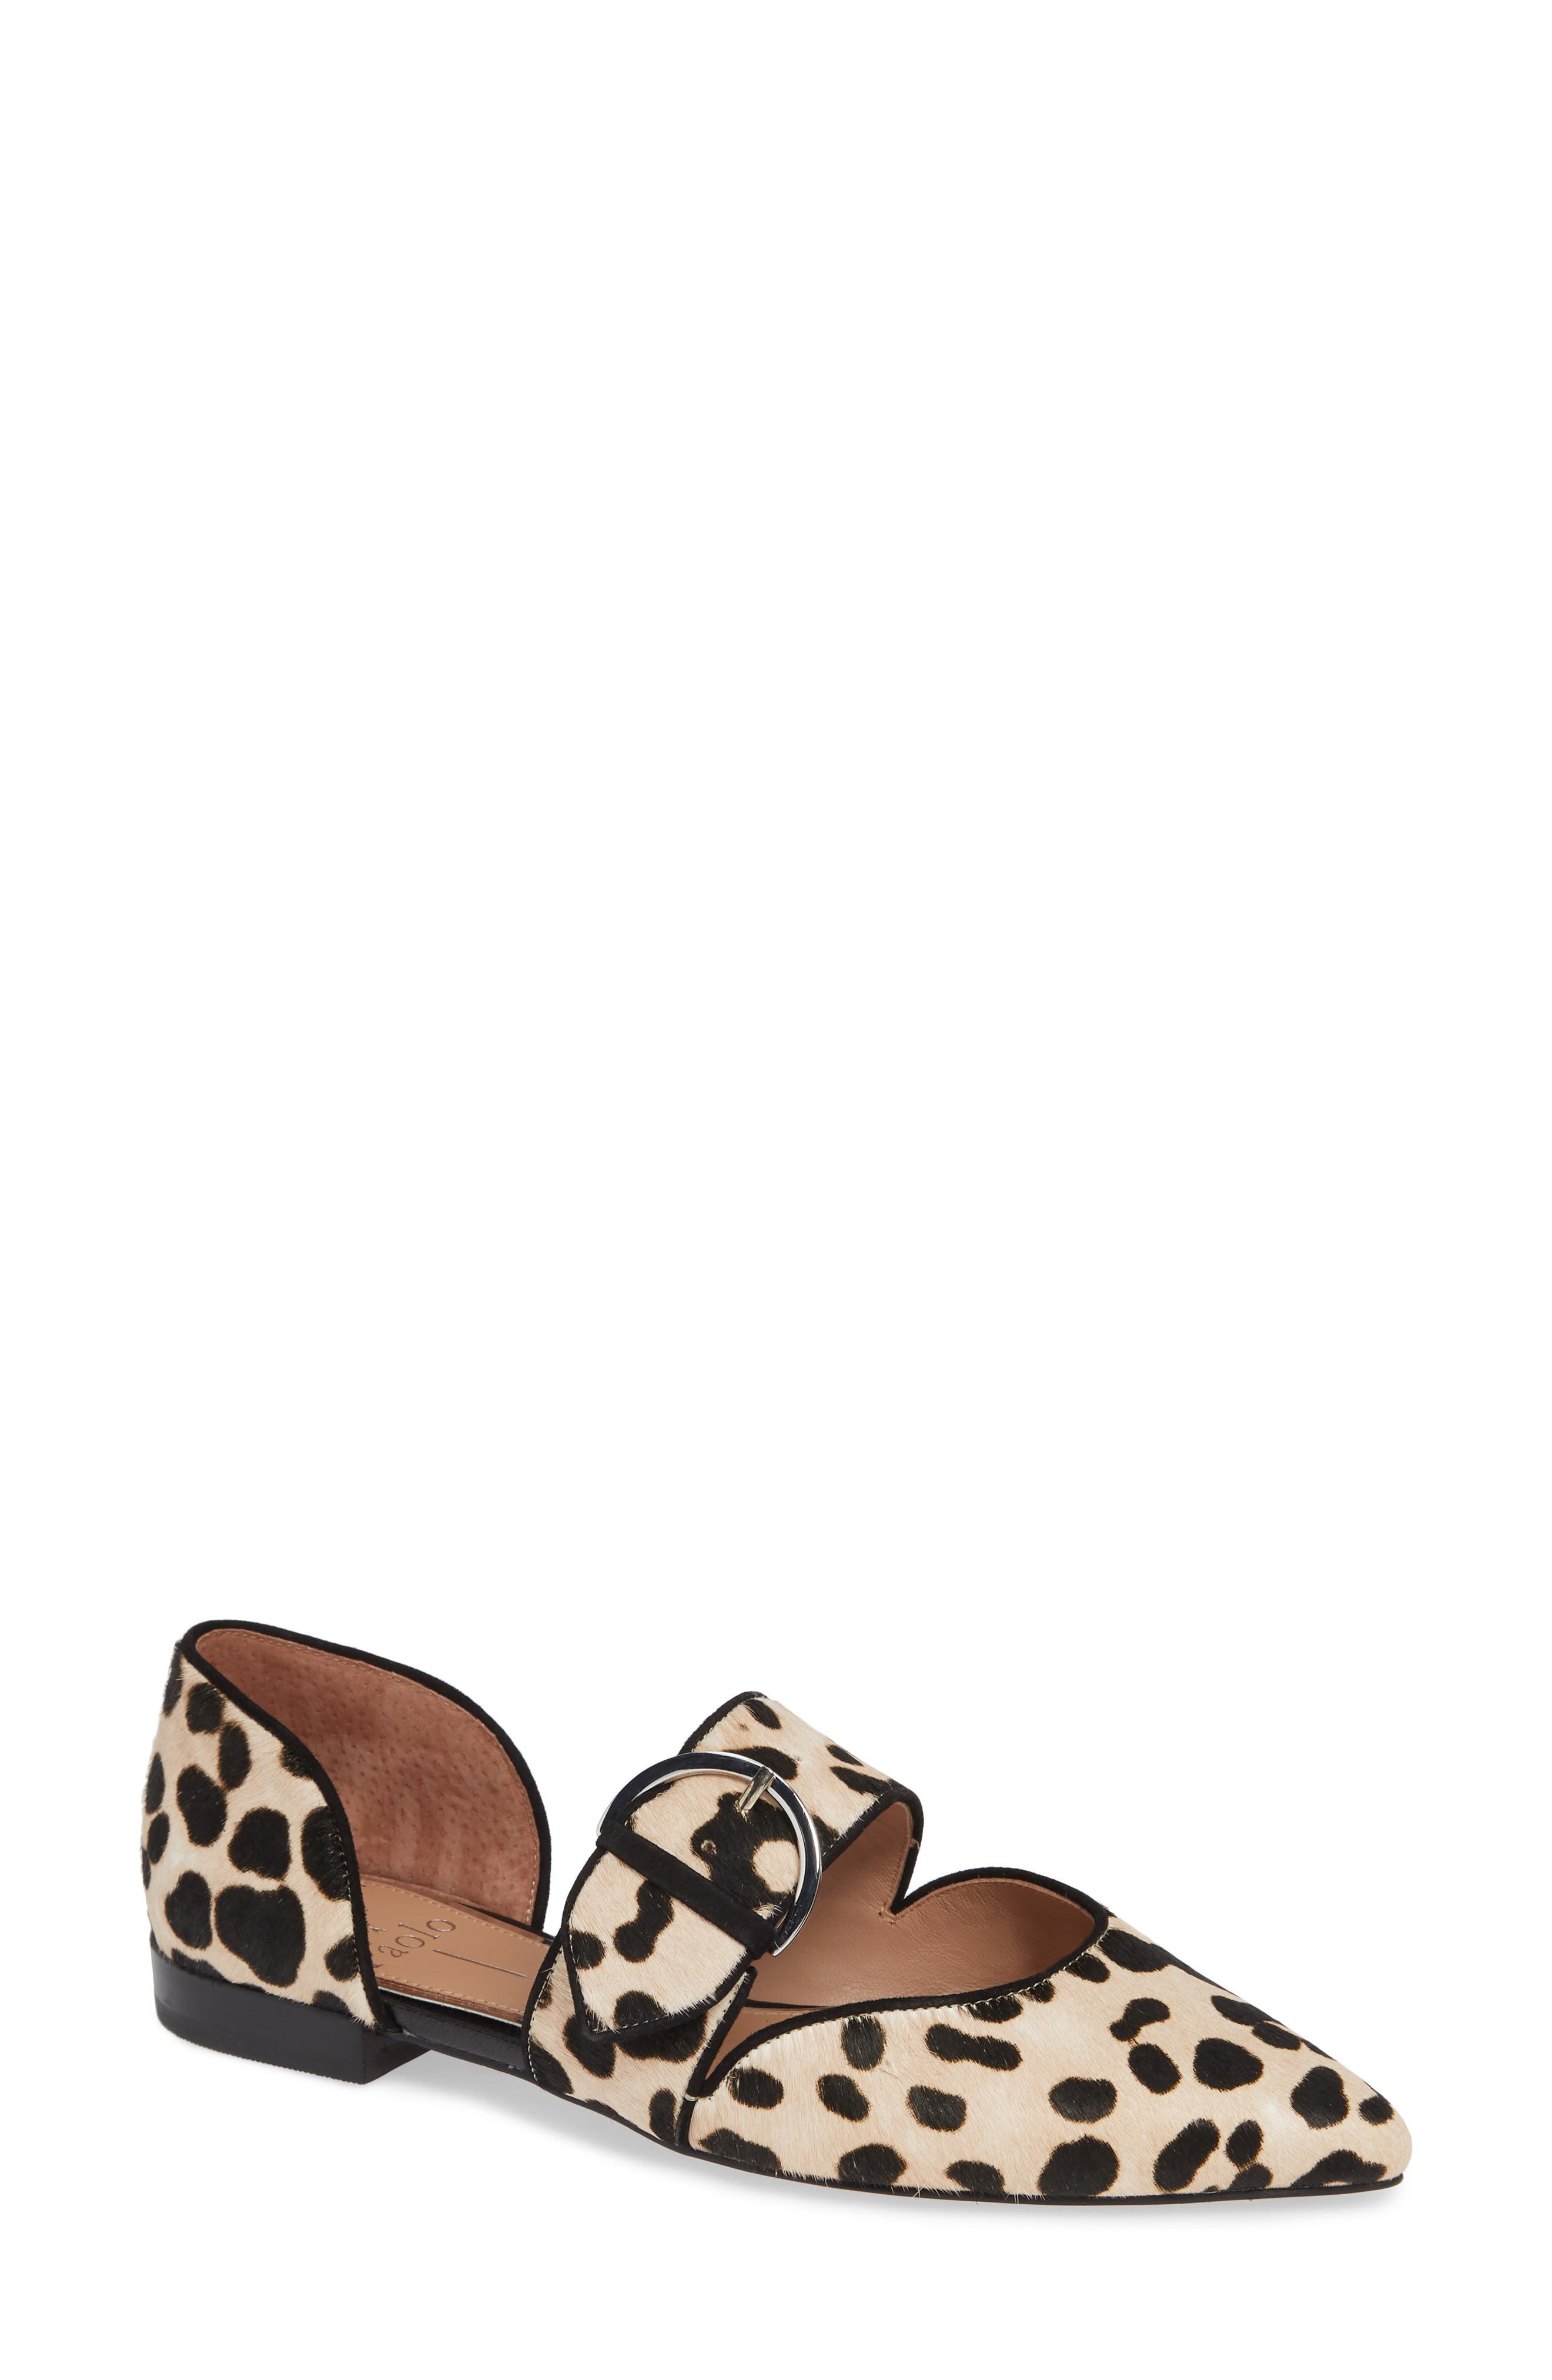 LINEA PAOLO, Dean Pointy Toe Flat, Main thumbnail 1, color, WHITE/ BLACK PRINT HAIRCALF